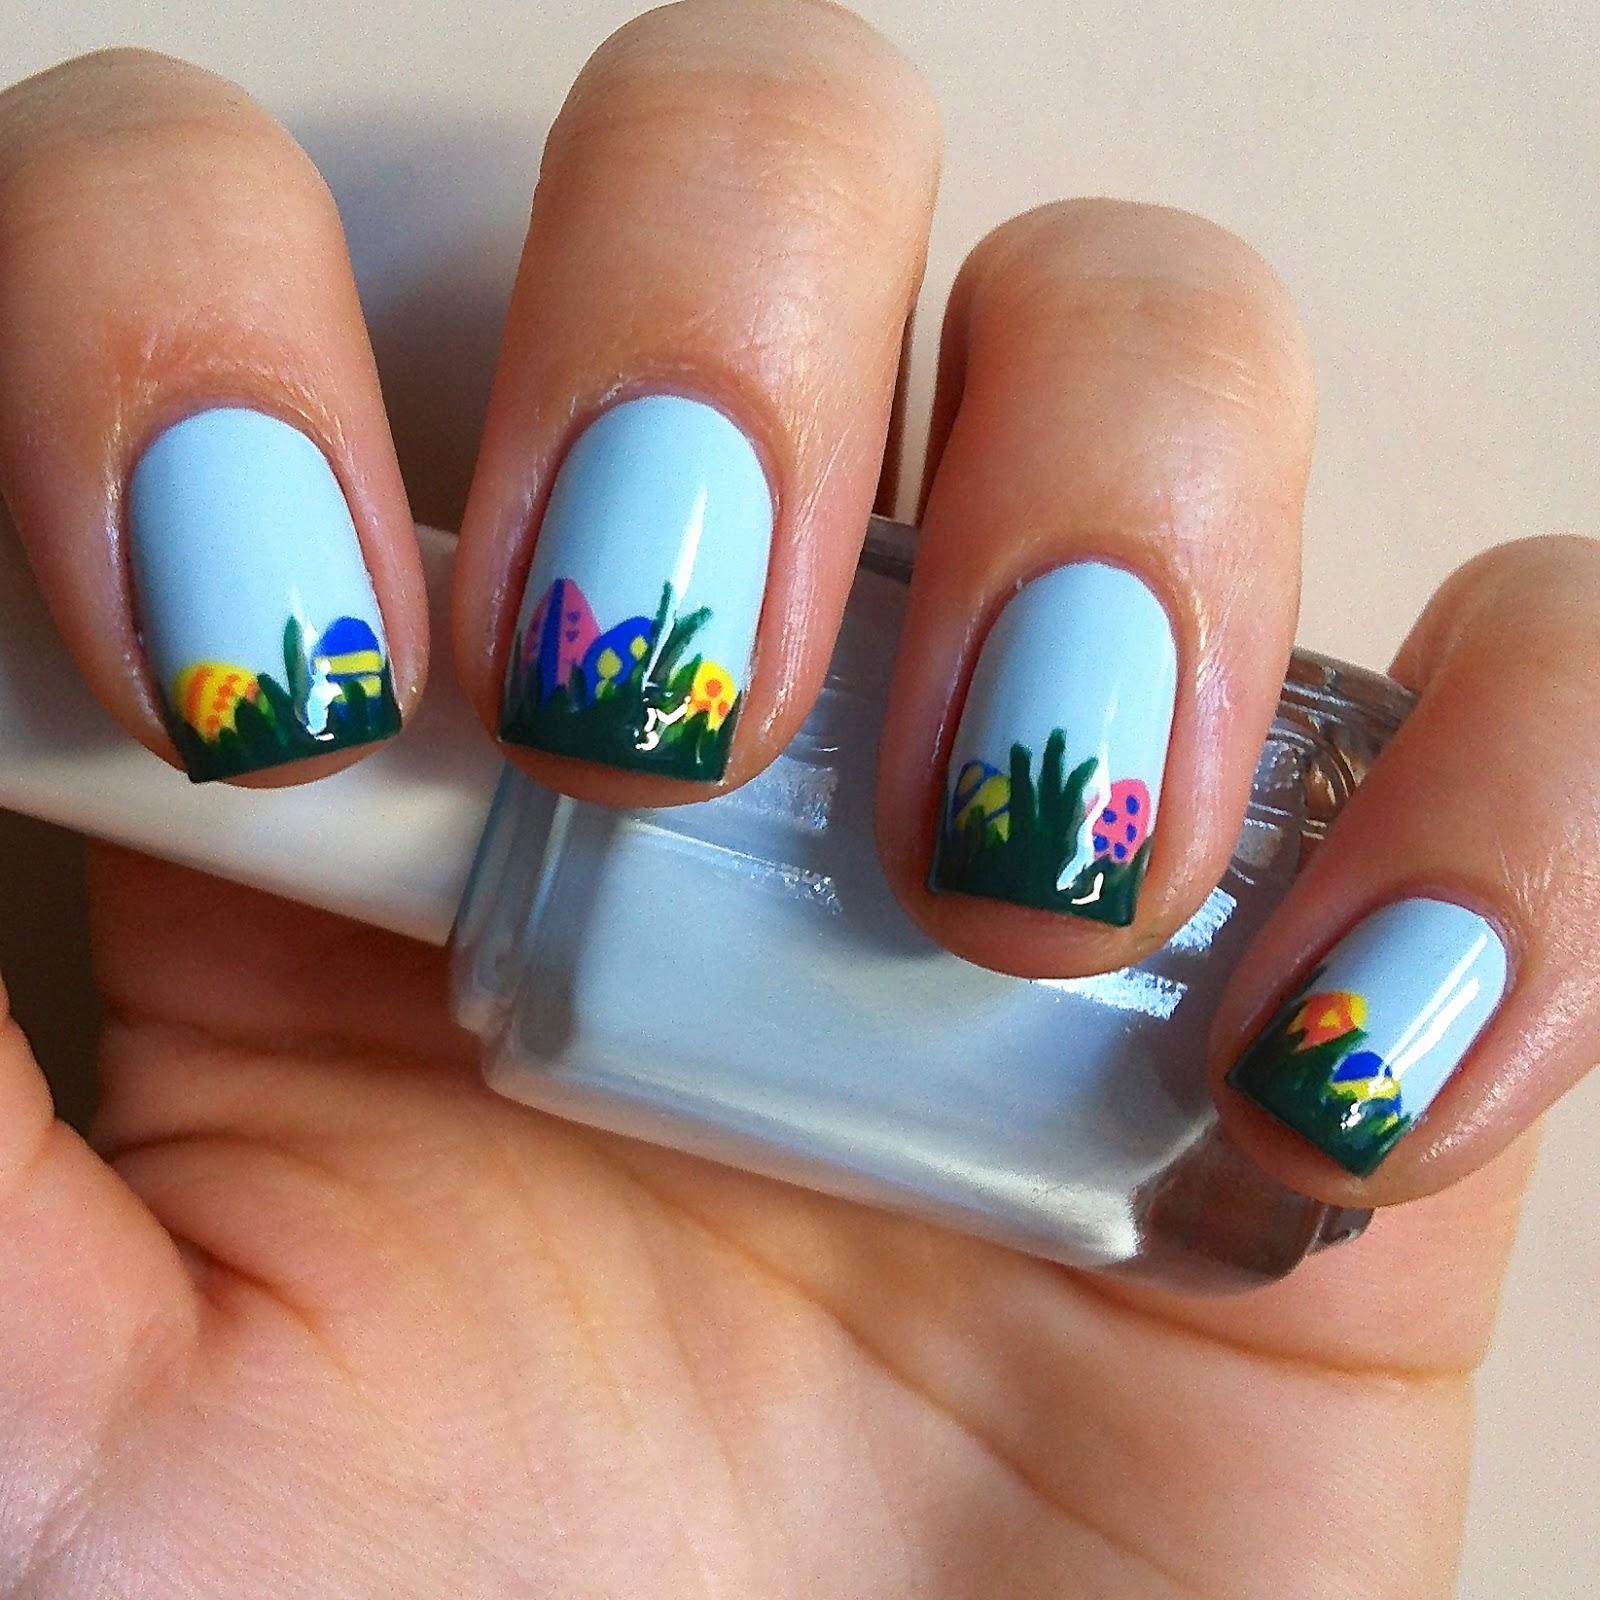 Nails Always Polished: Easter Manicure #4